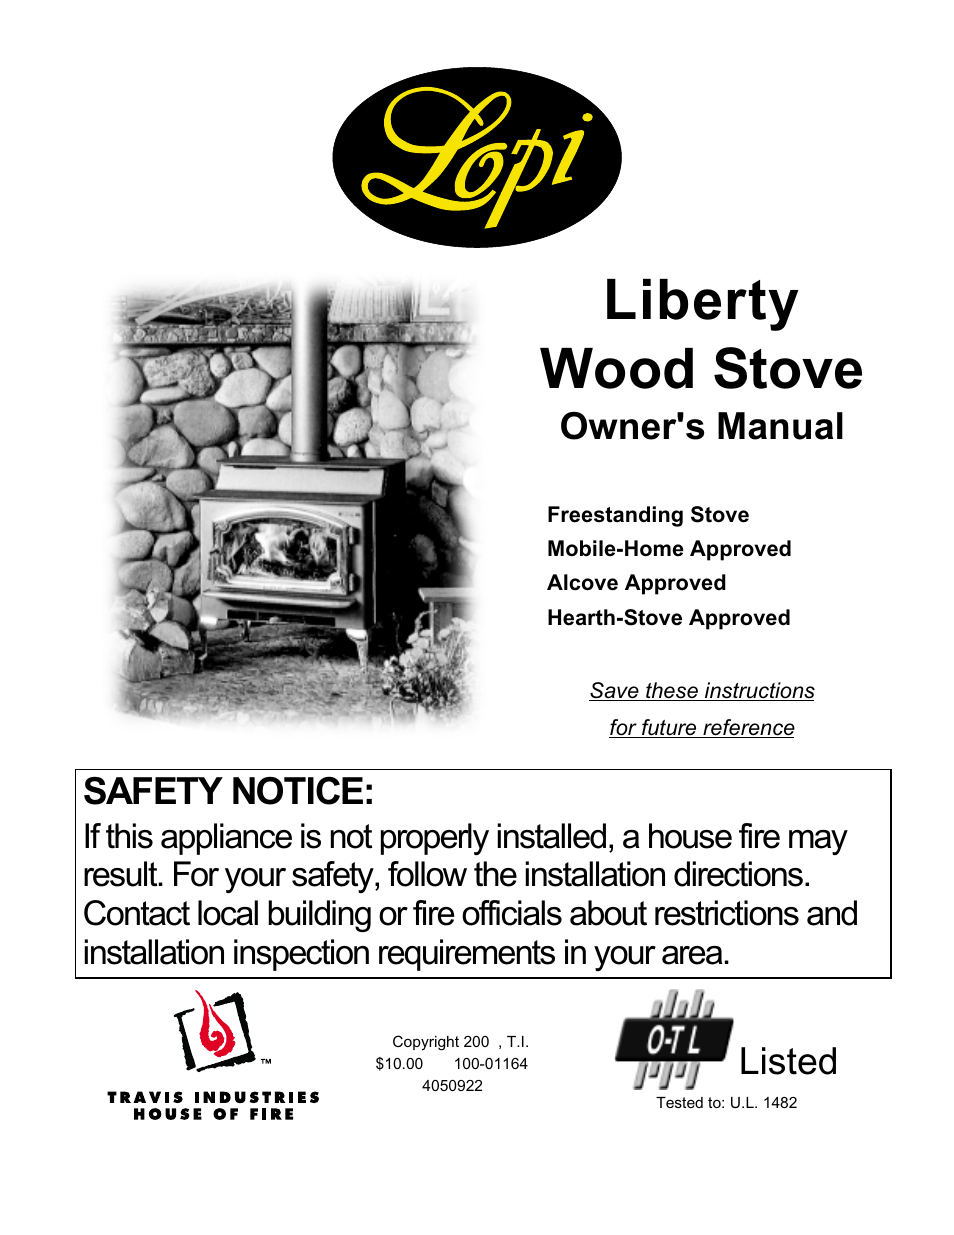 Lopi Liberty Wood Stove User Manual | 38 pages